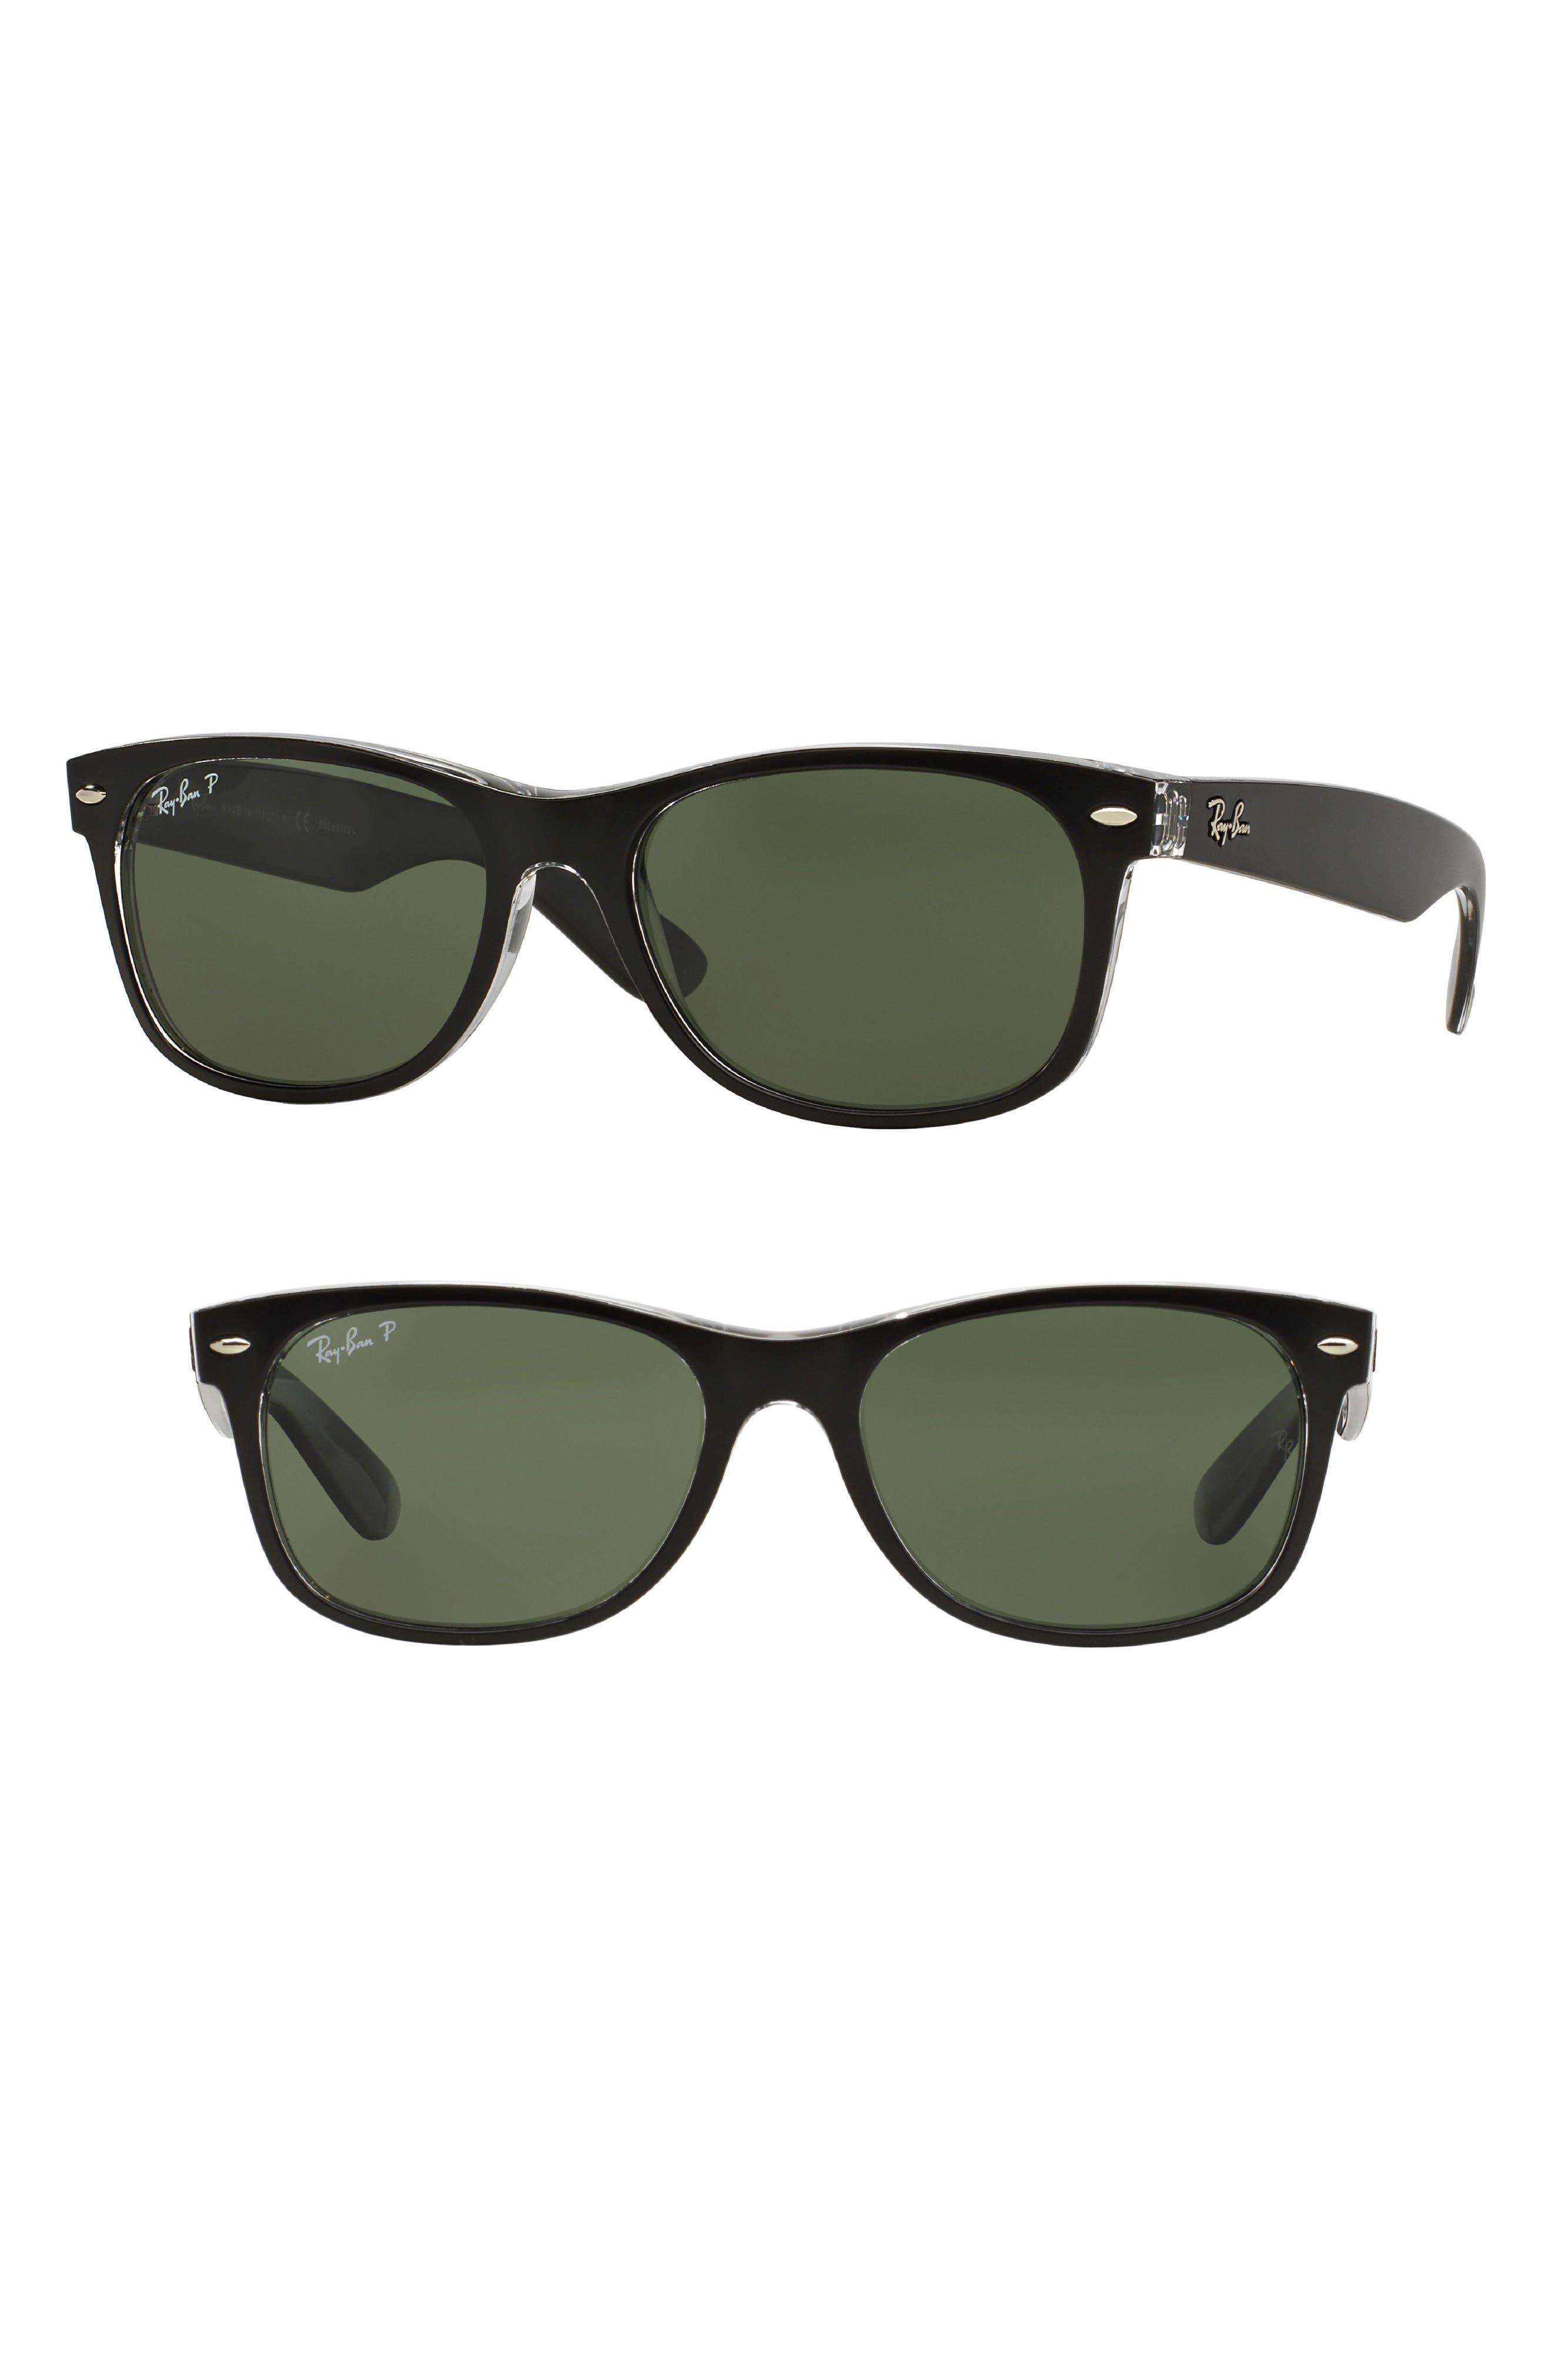 Standard New Wayfarer 55mm Polarized Sunglasses,                         Main,                         color, 010